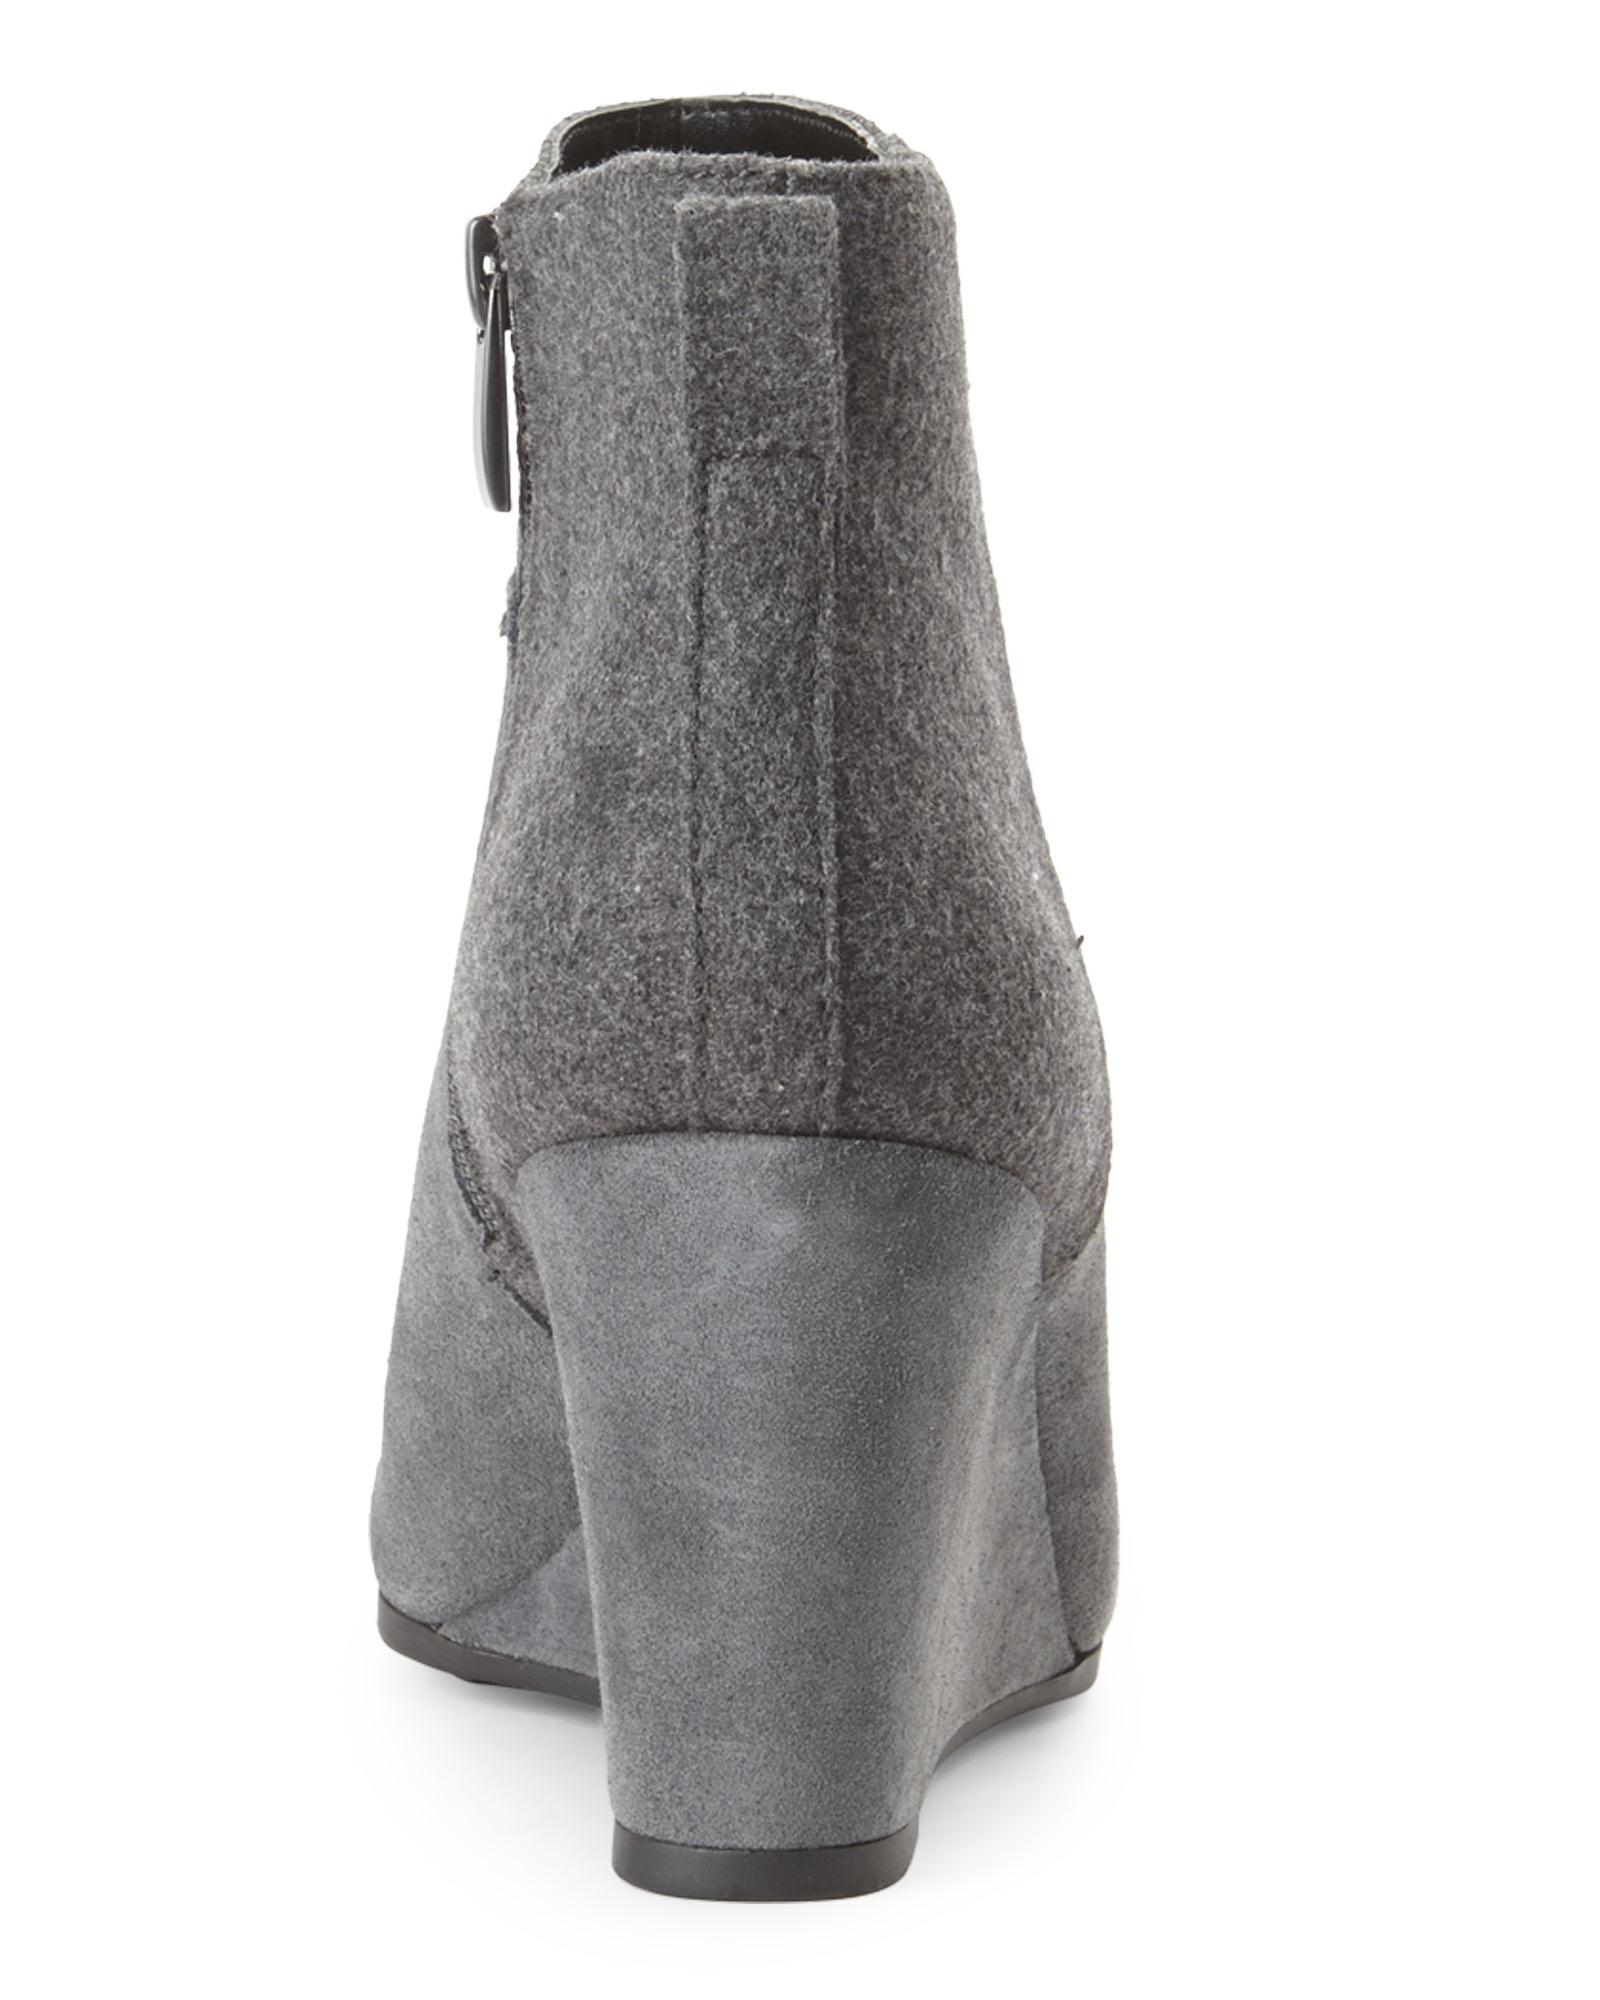 7cca45b53ff Lyst - Tahari Elephant Grey Sutton Wedge Boots in Gray